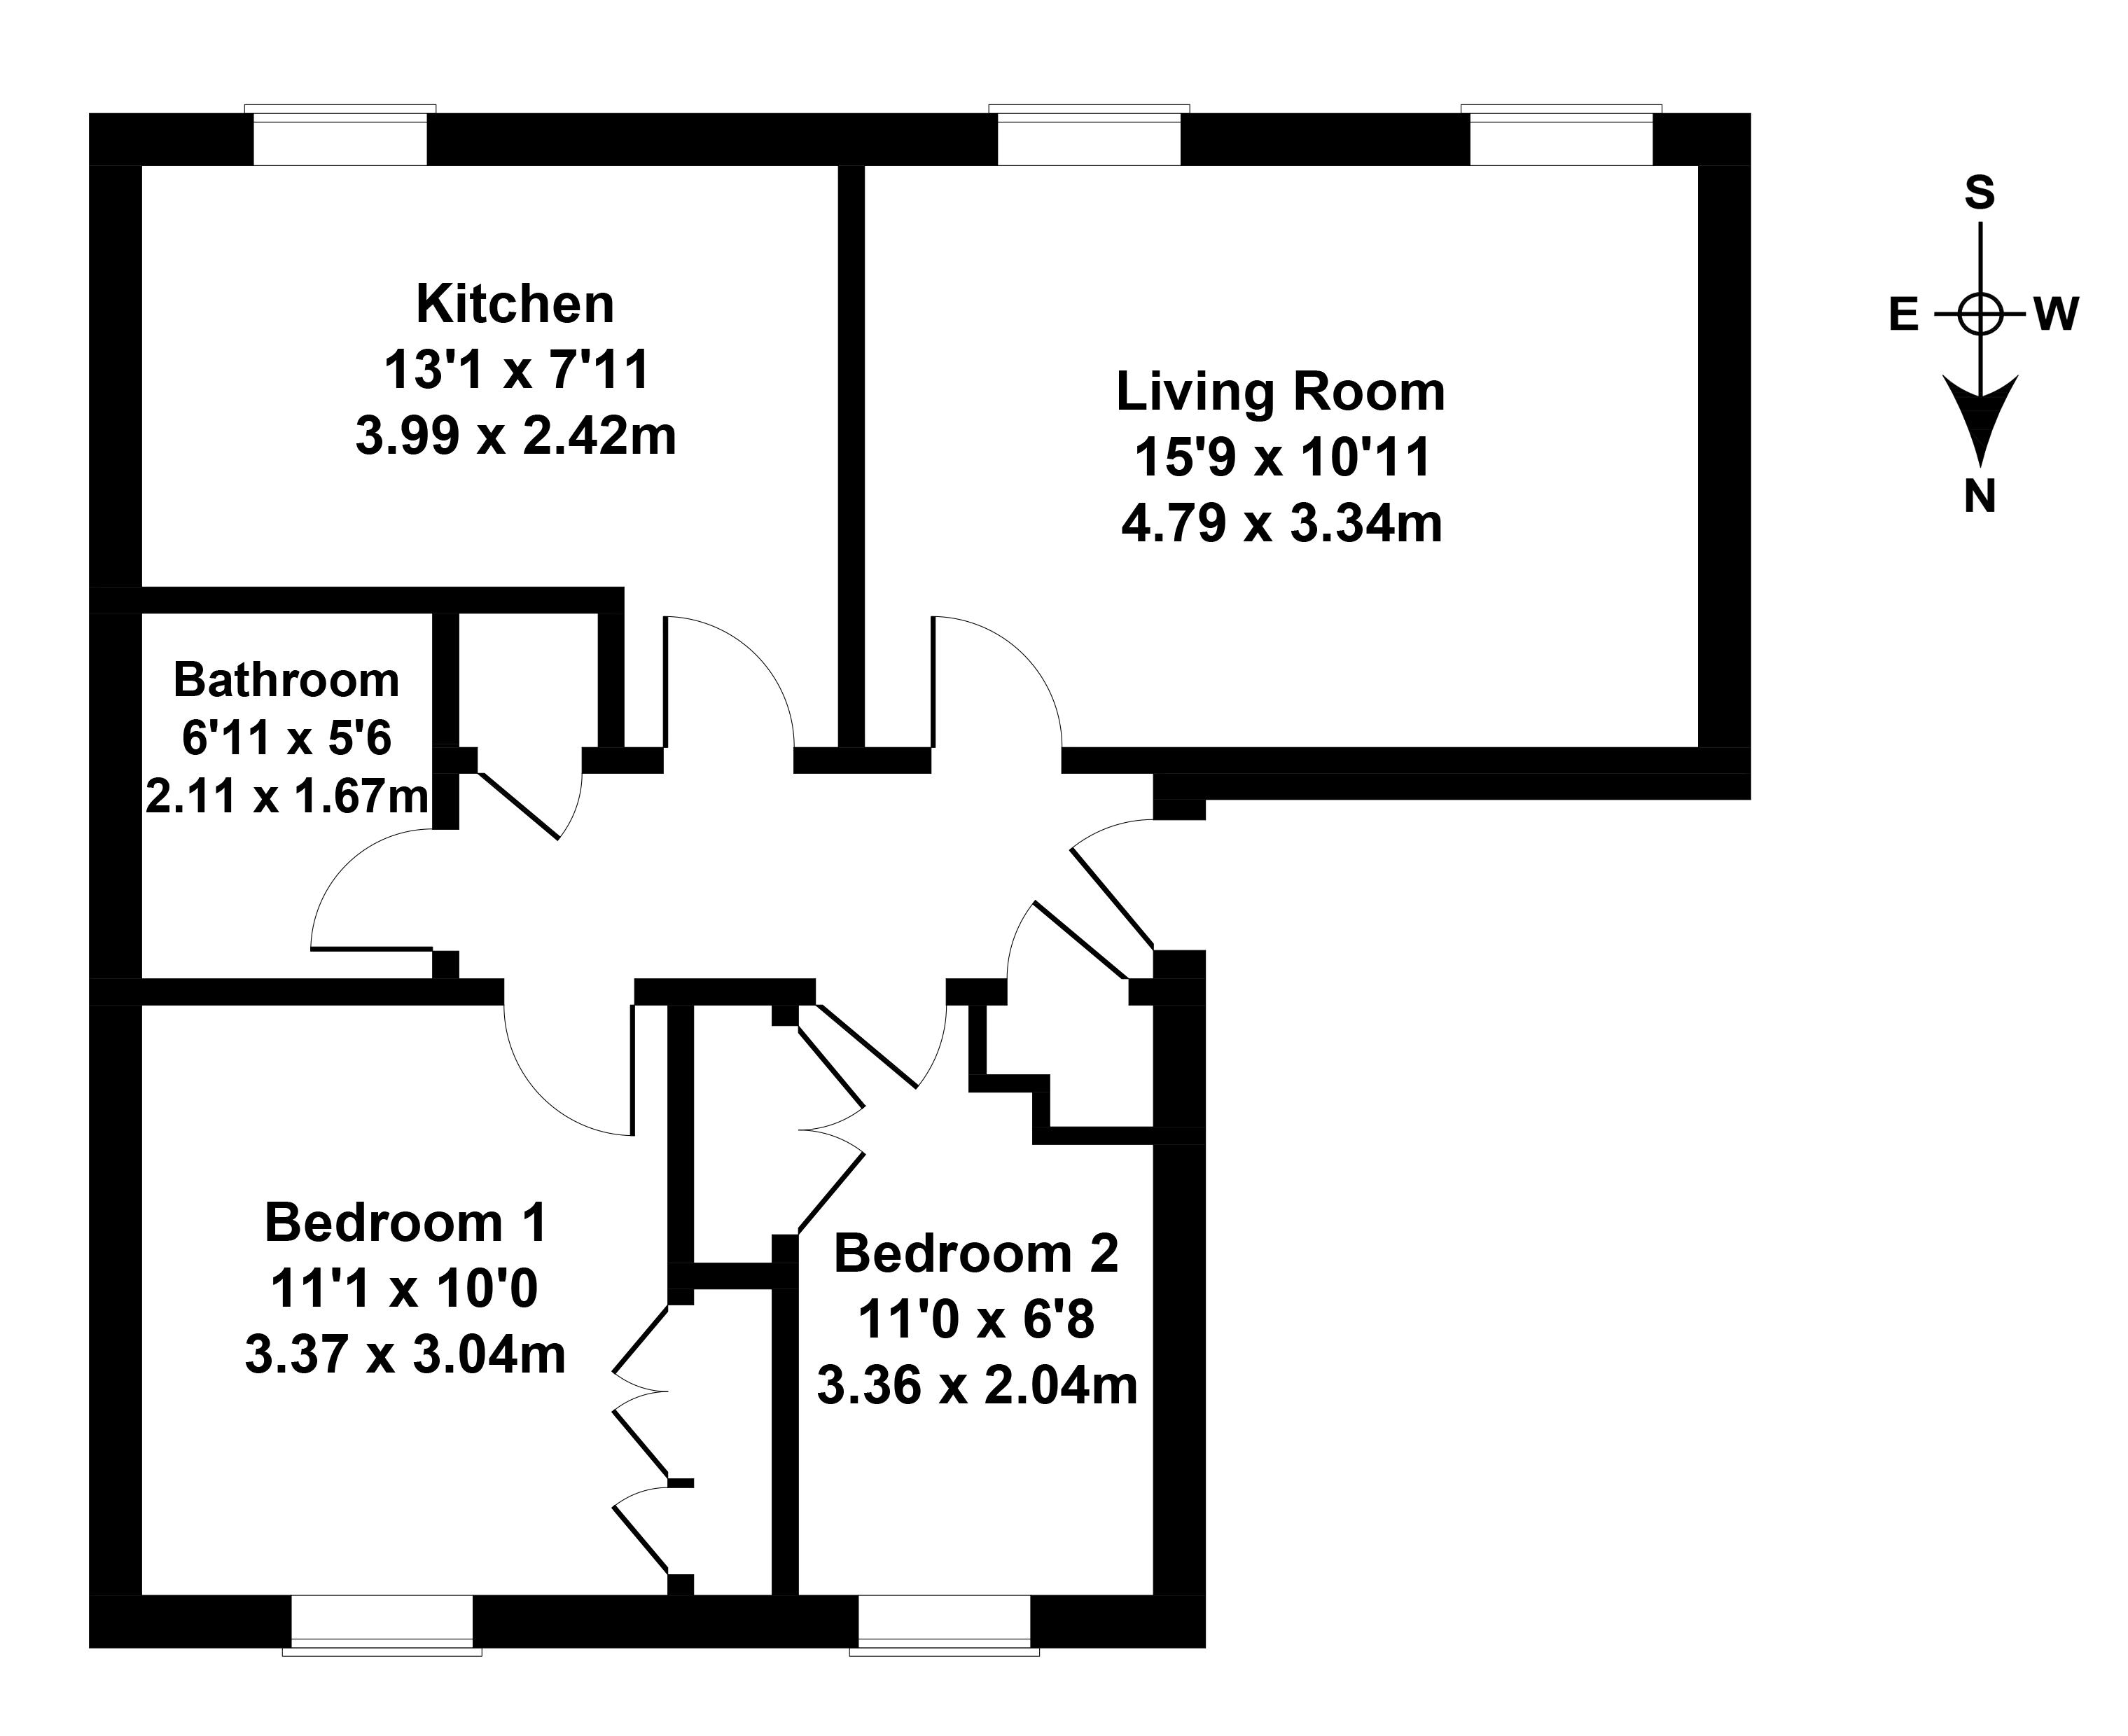 Floorplan 1 of 21/1, Margaret Rose Drive, Fairmilehead, Edinburgh, EH10 7ER